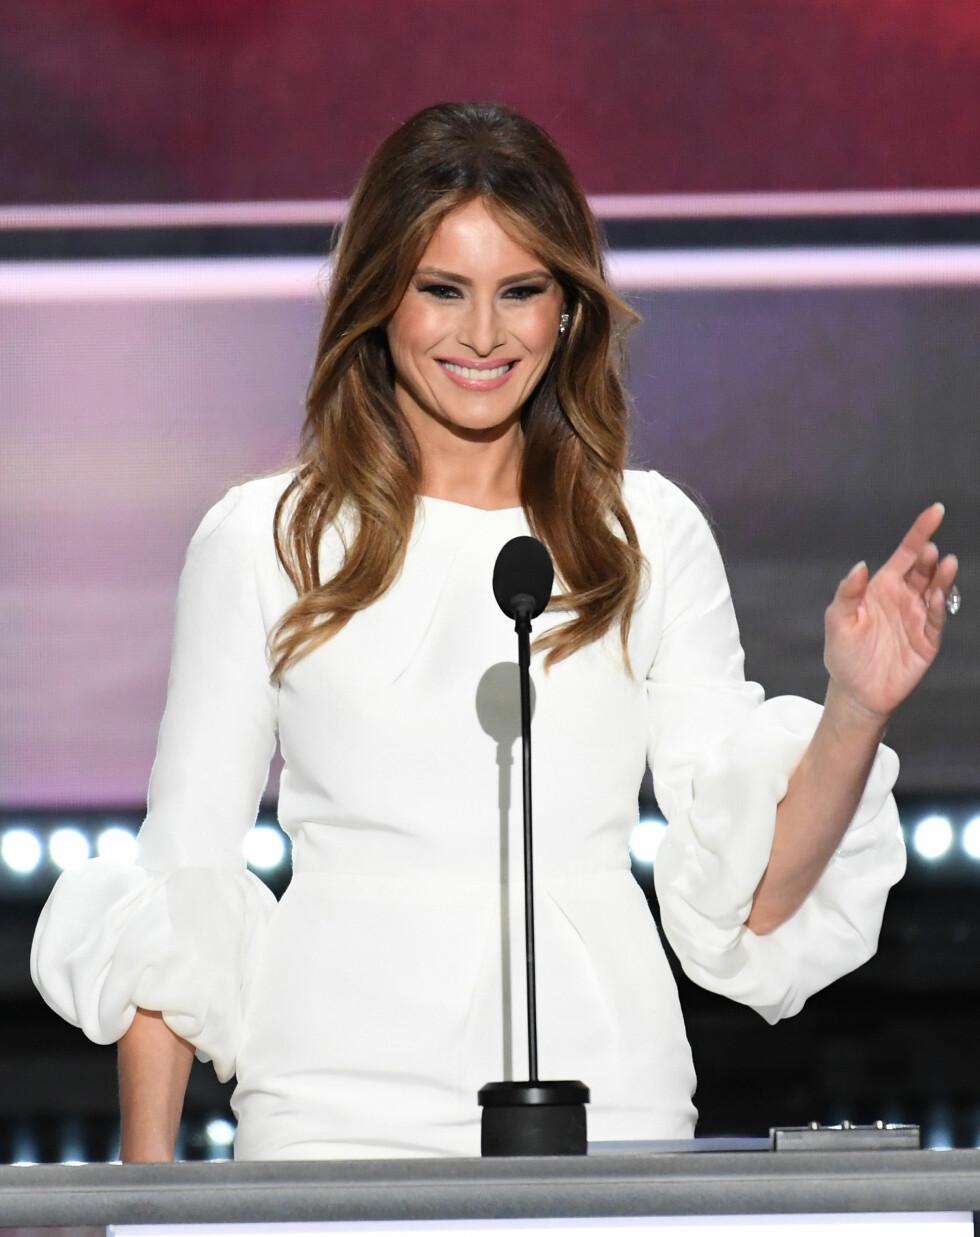 UHELDIG TALE: Melania Trump ble anklaget for plagiat av Michelle Obamas tale under Republican National Convention.  Foto: DPA